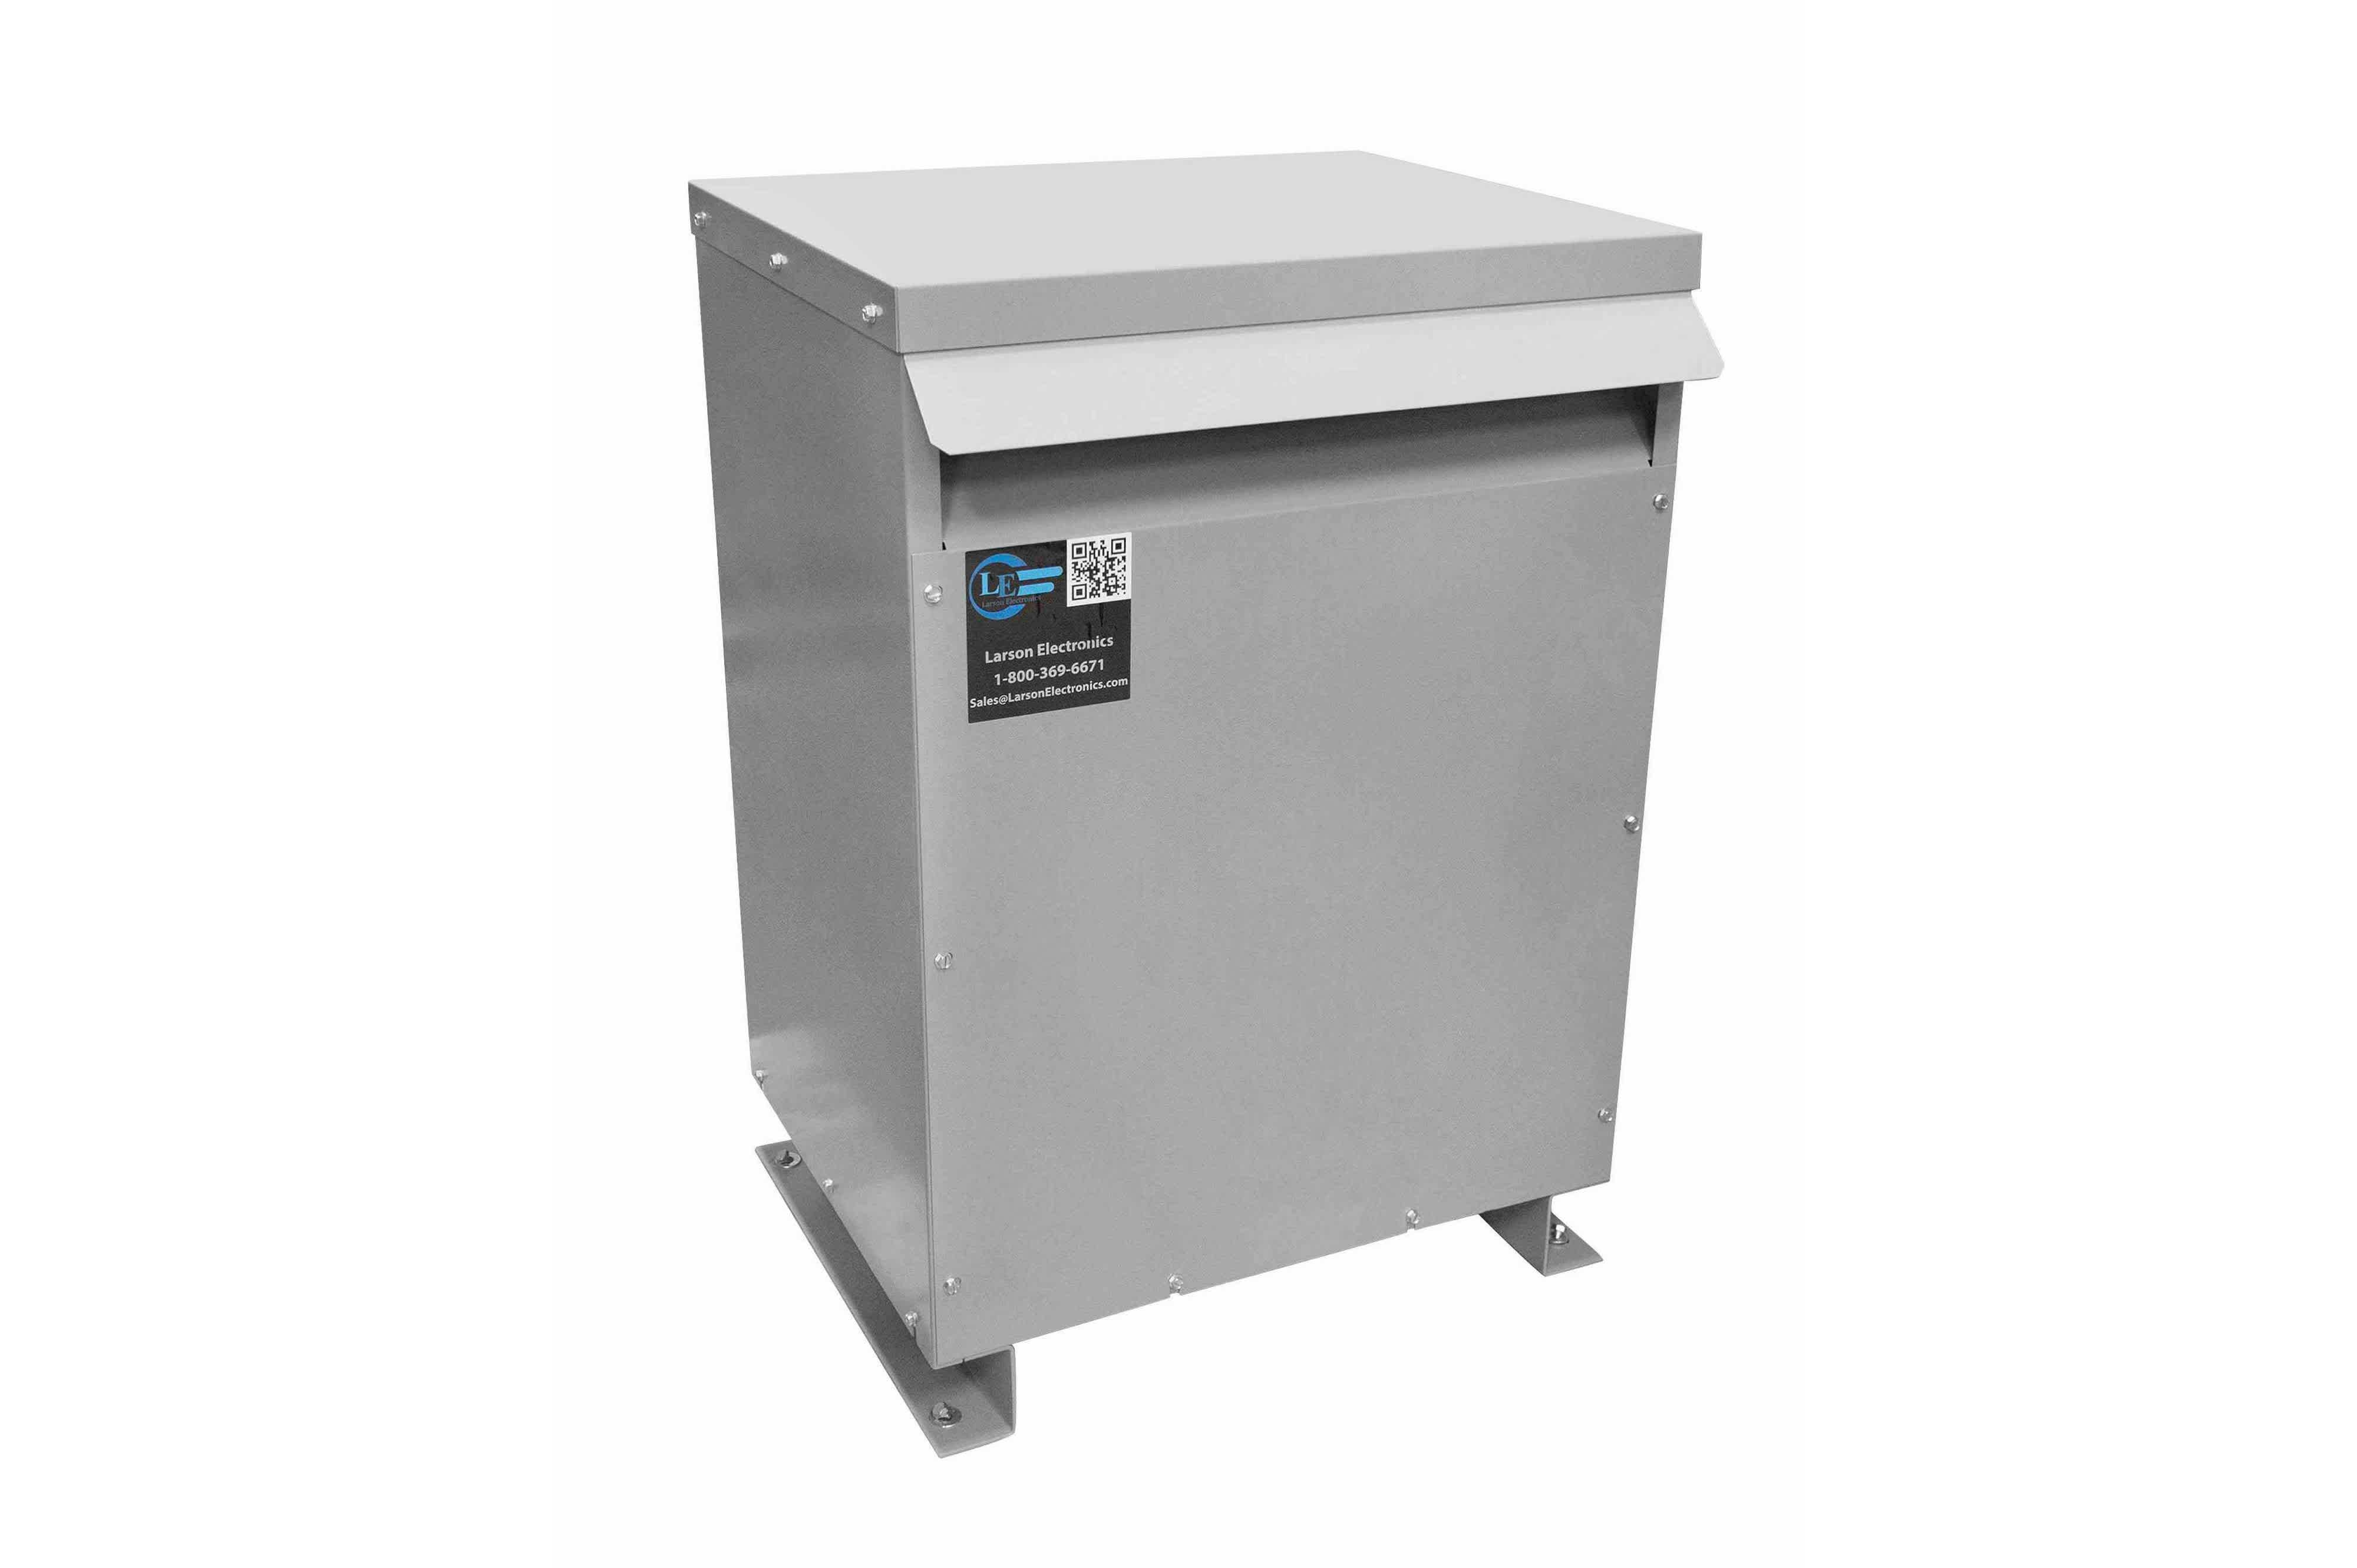 1000 kVA 3PH Isolation Transformer, 208V Wye Primary, 380Y/220 Wye-N Secondary, N3R, Ventilated, 60 Hz